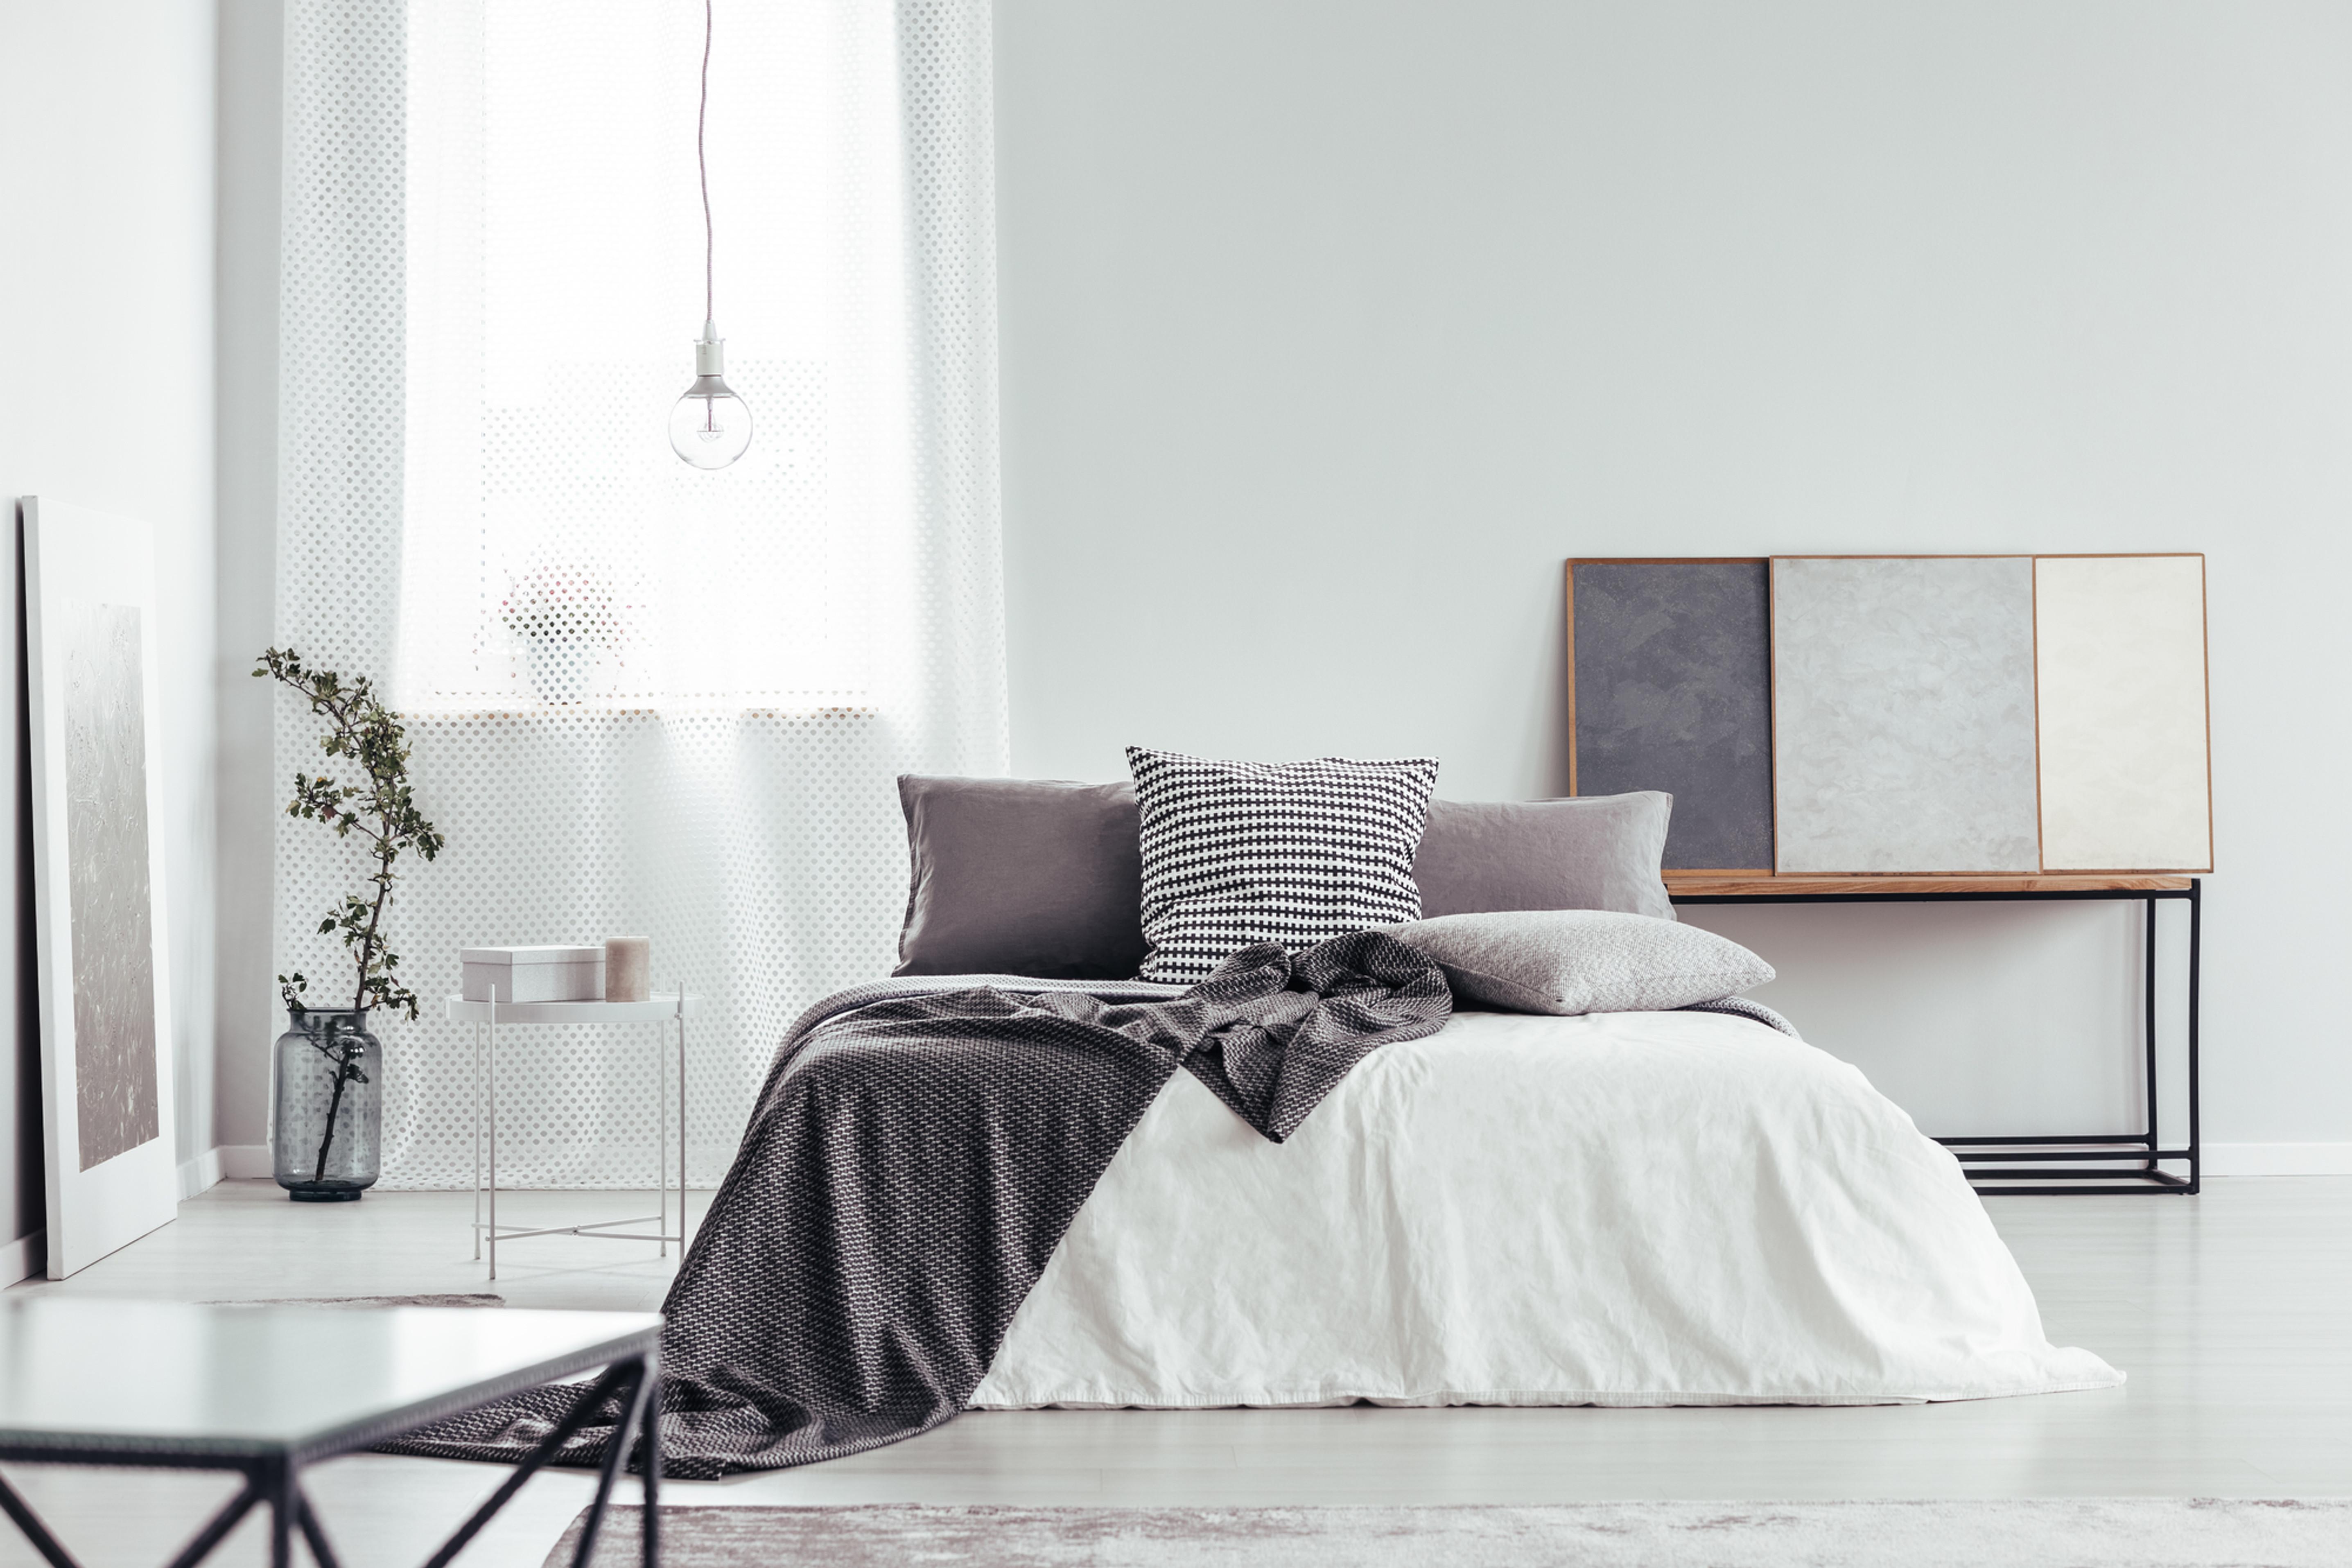 Closet/ Bedroom